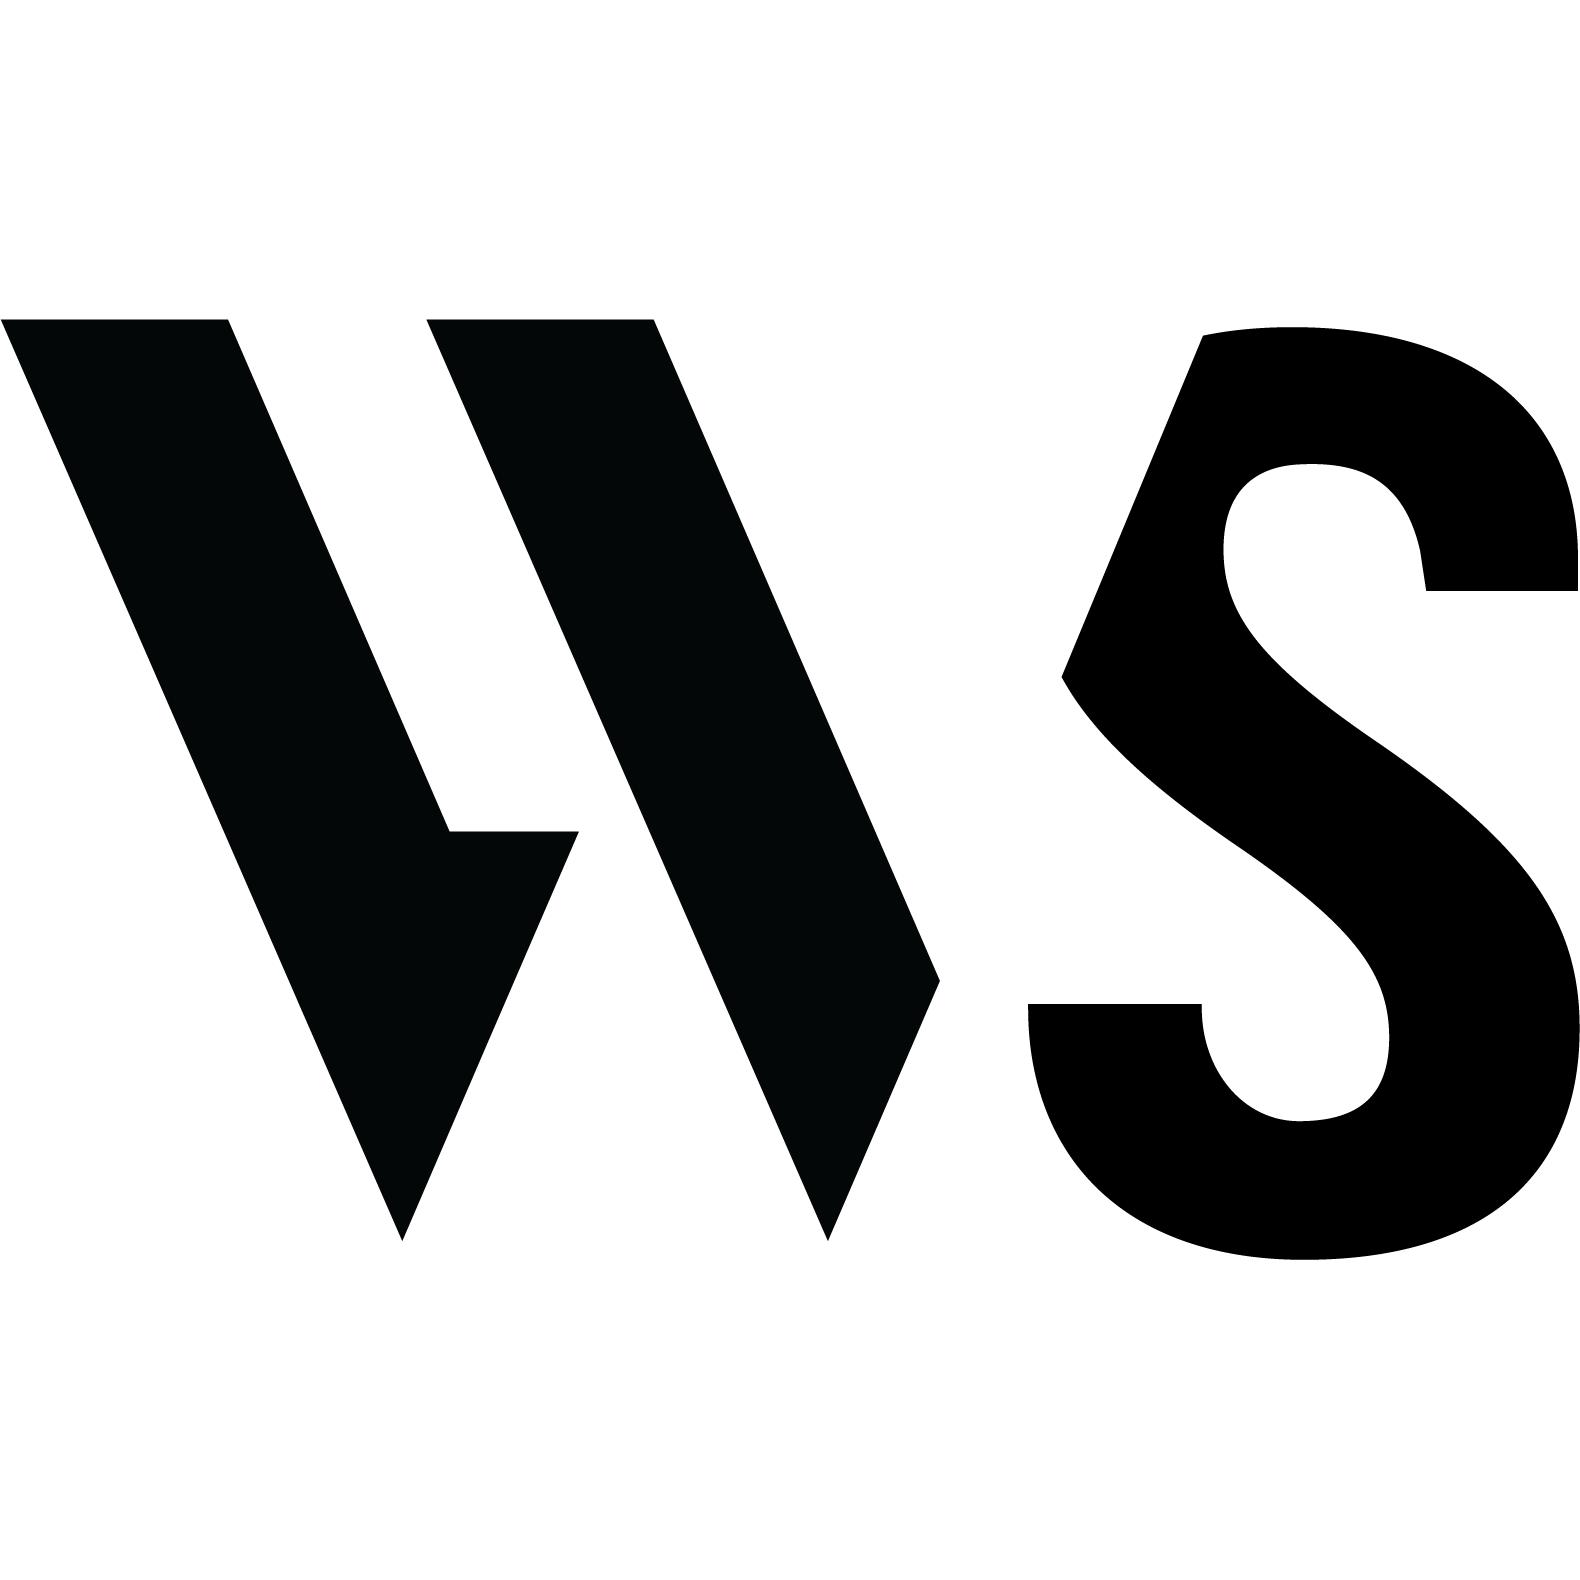 West Stationery